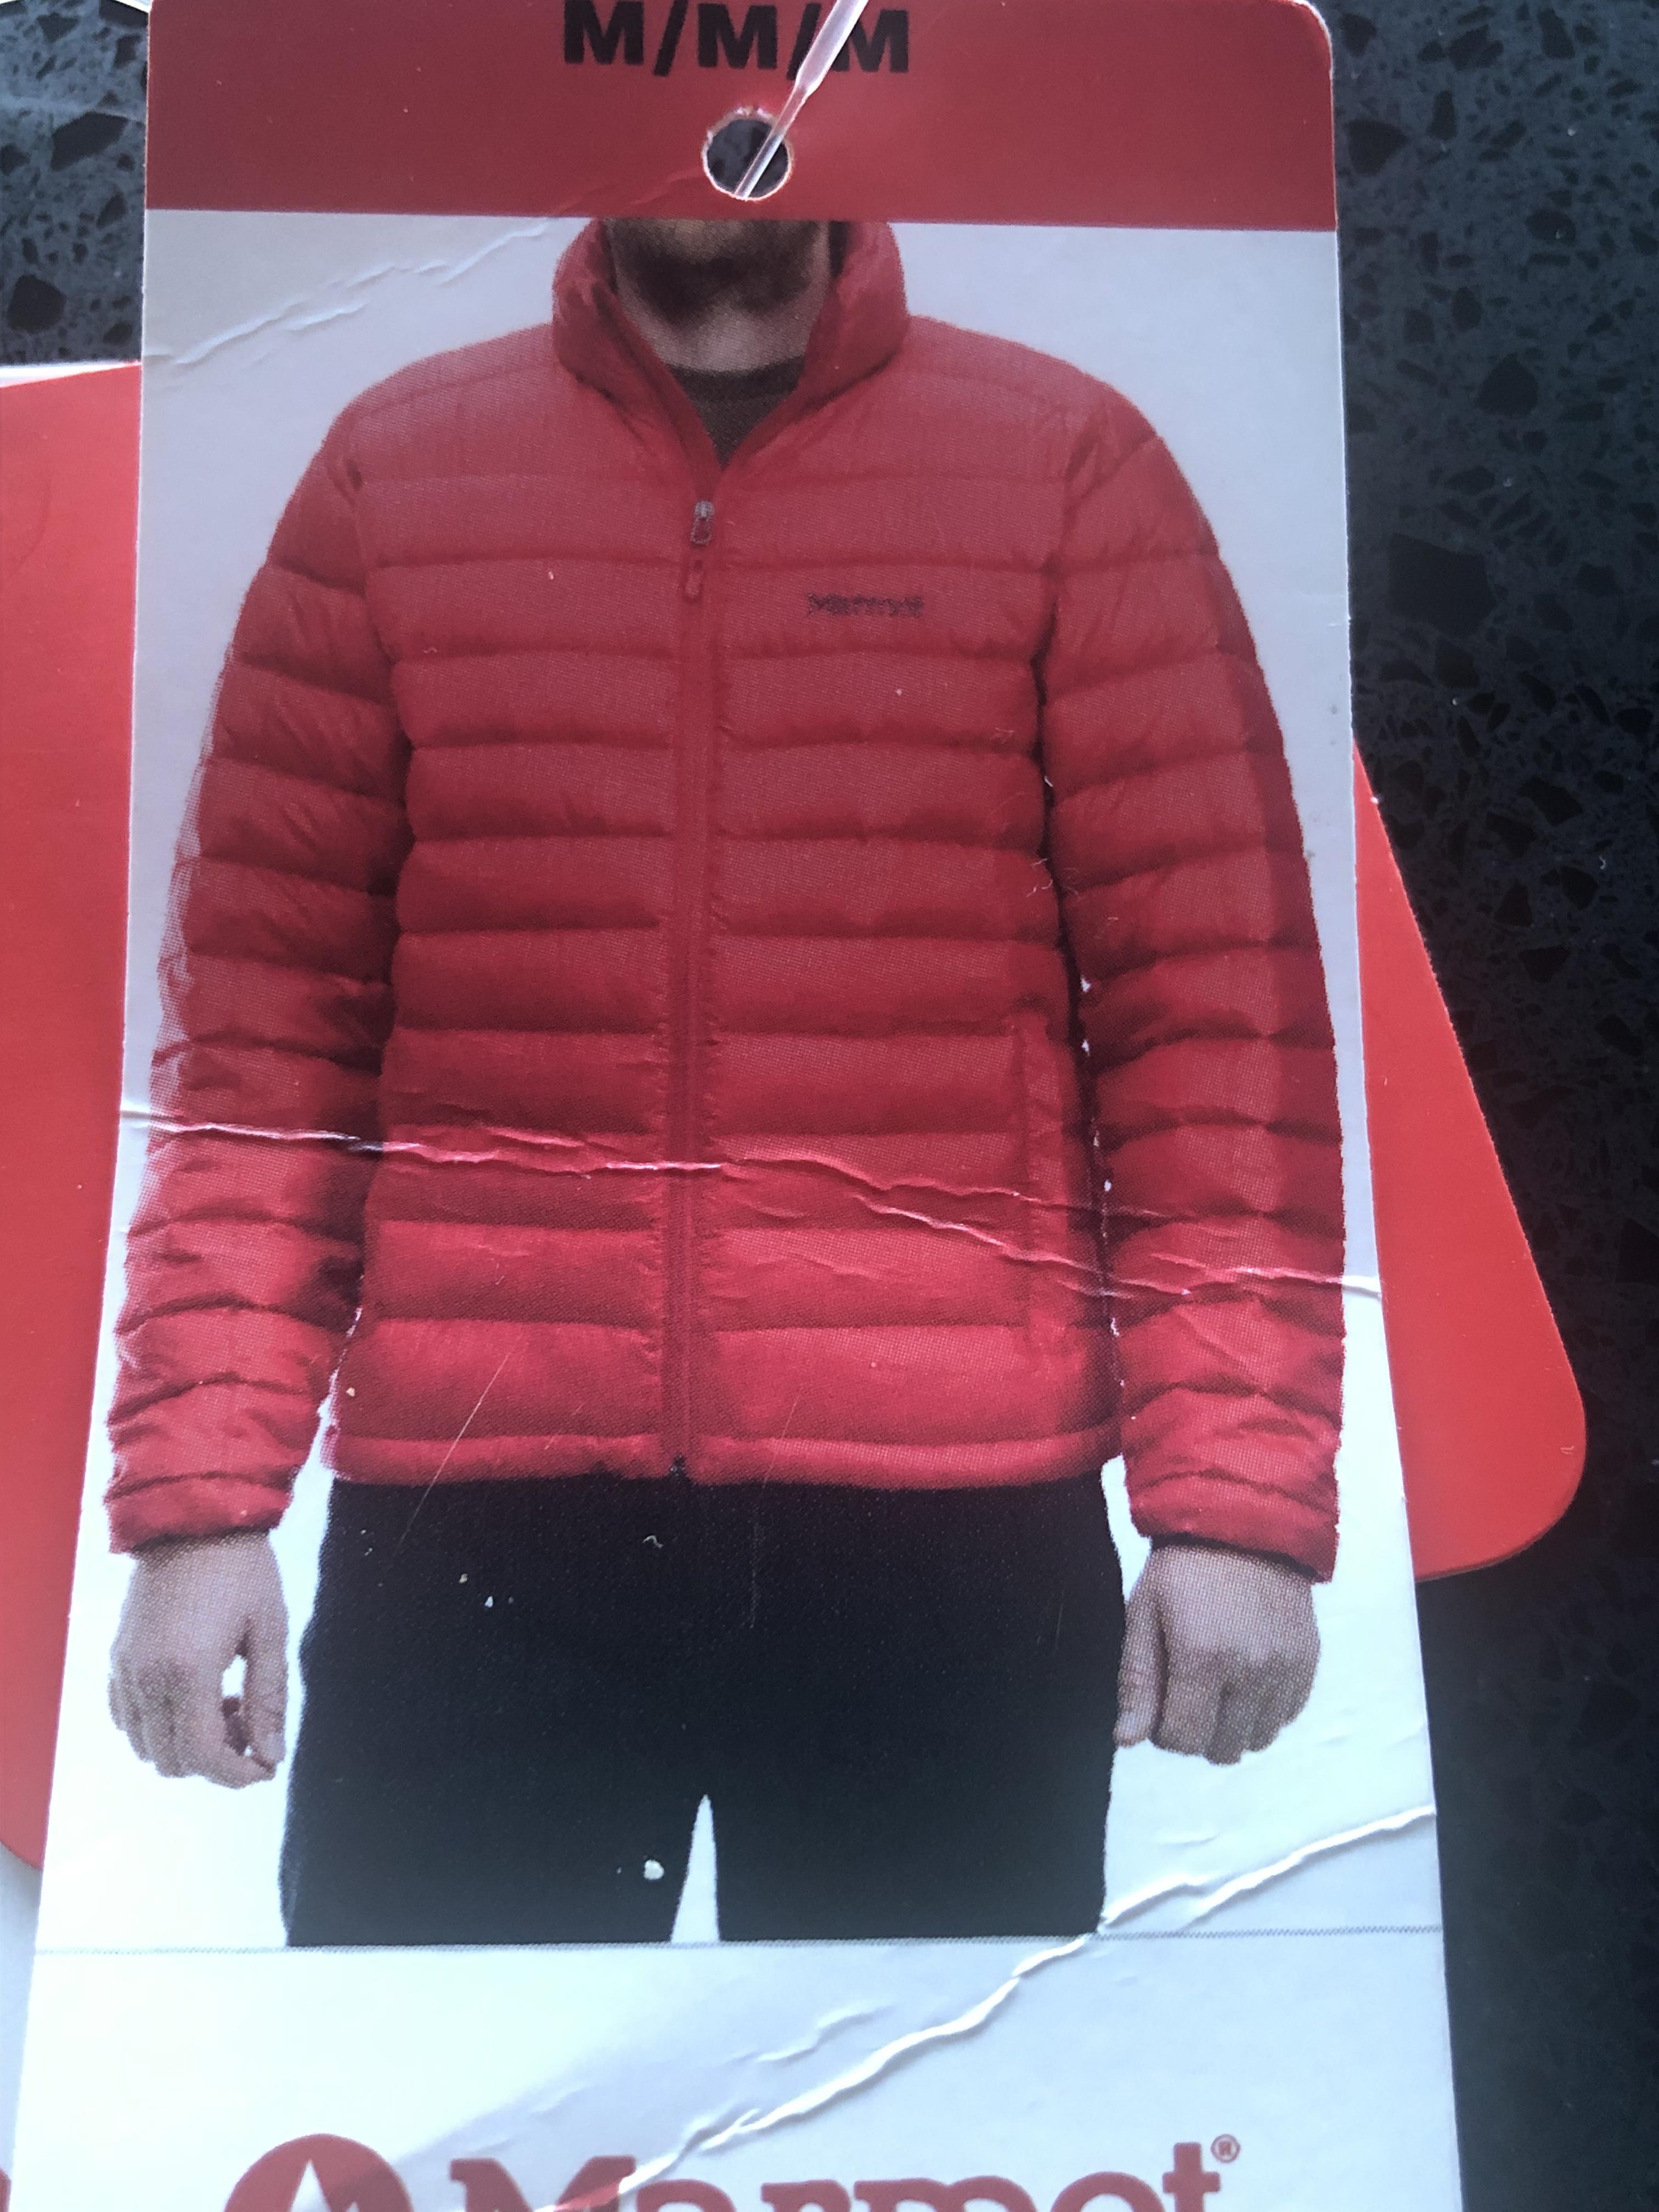 Marmot azos down jacket £59.96 instore at Costco Gateshead price includes VAT